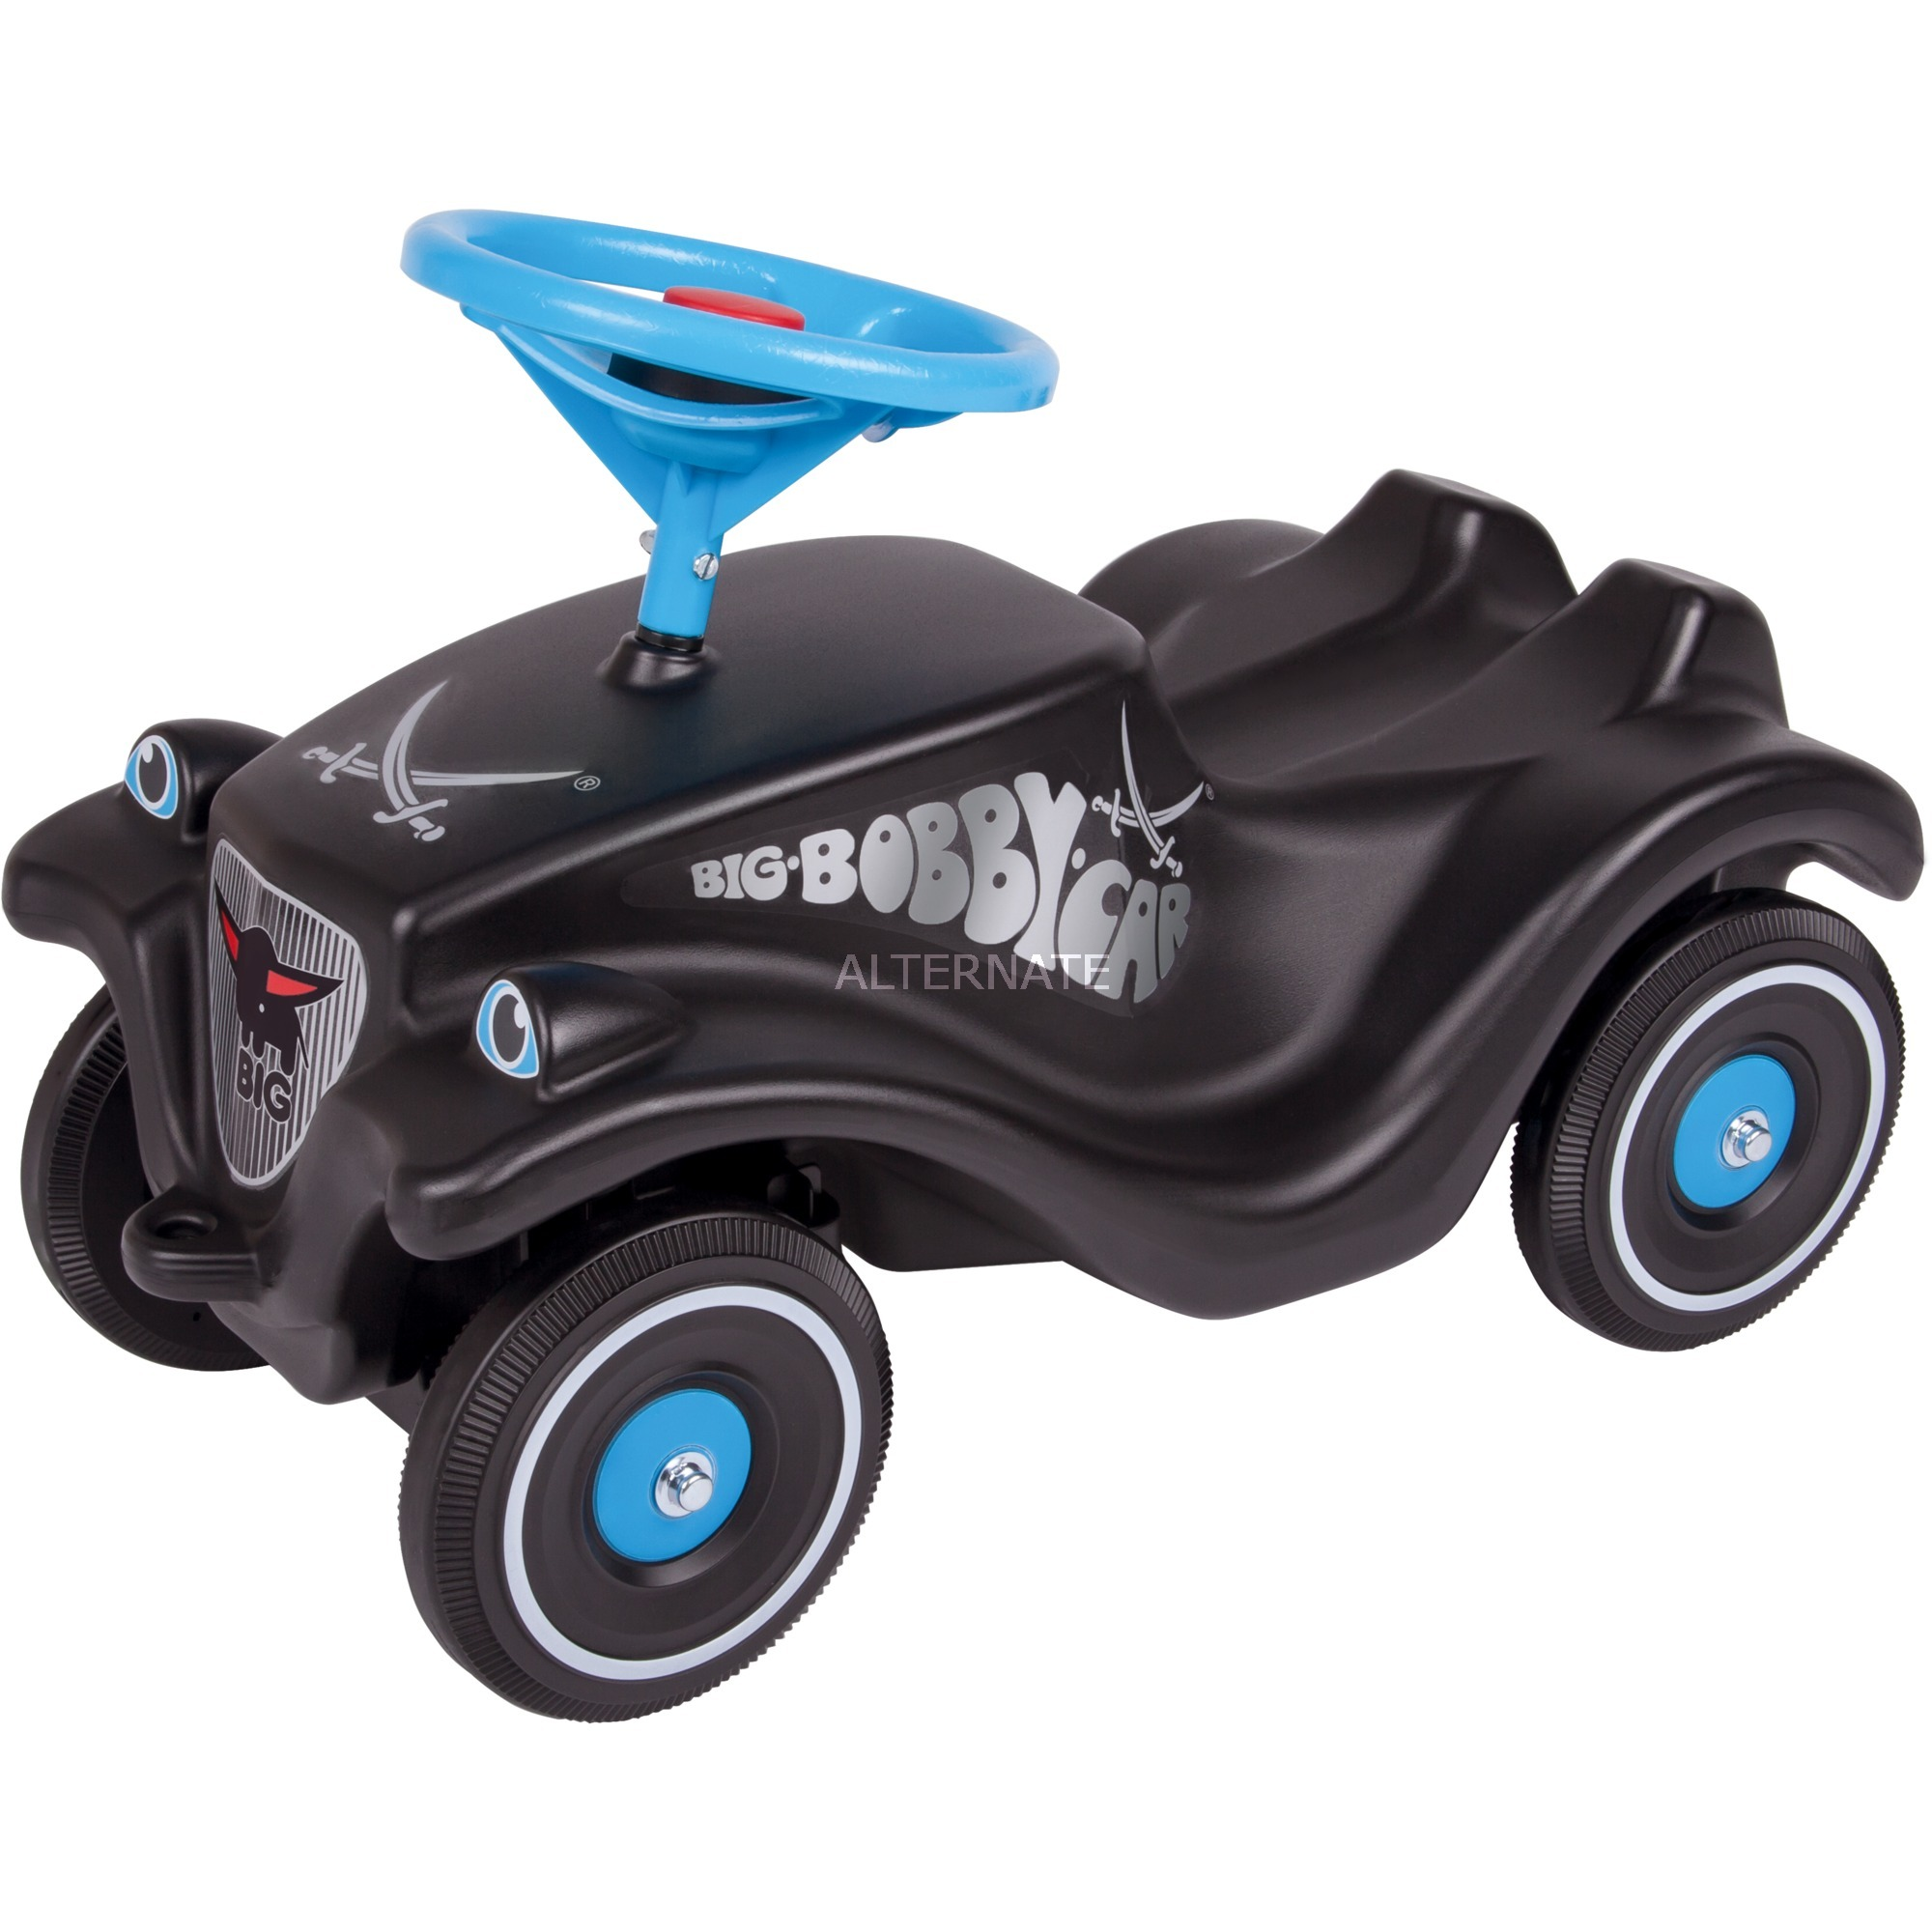 800056093 juguete de montar, Tobogán